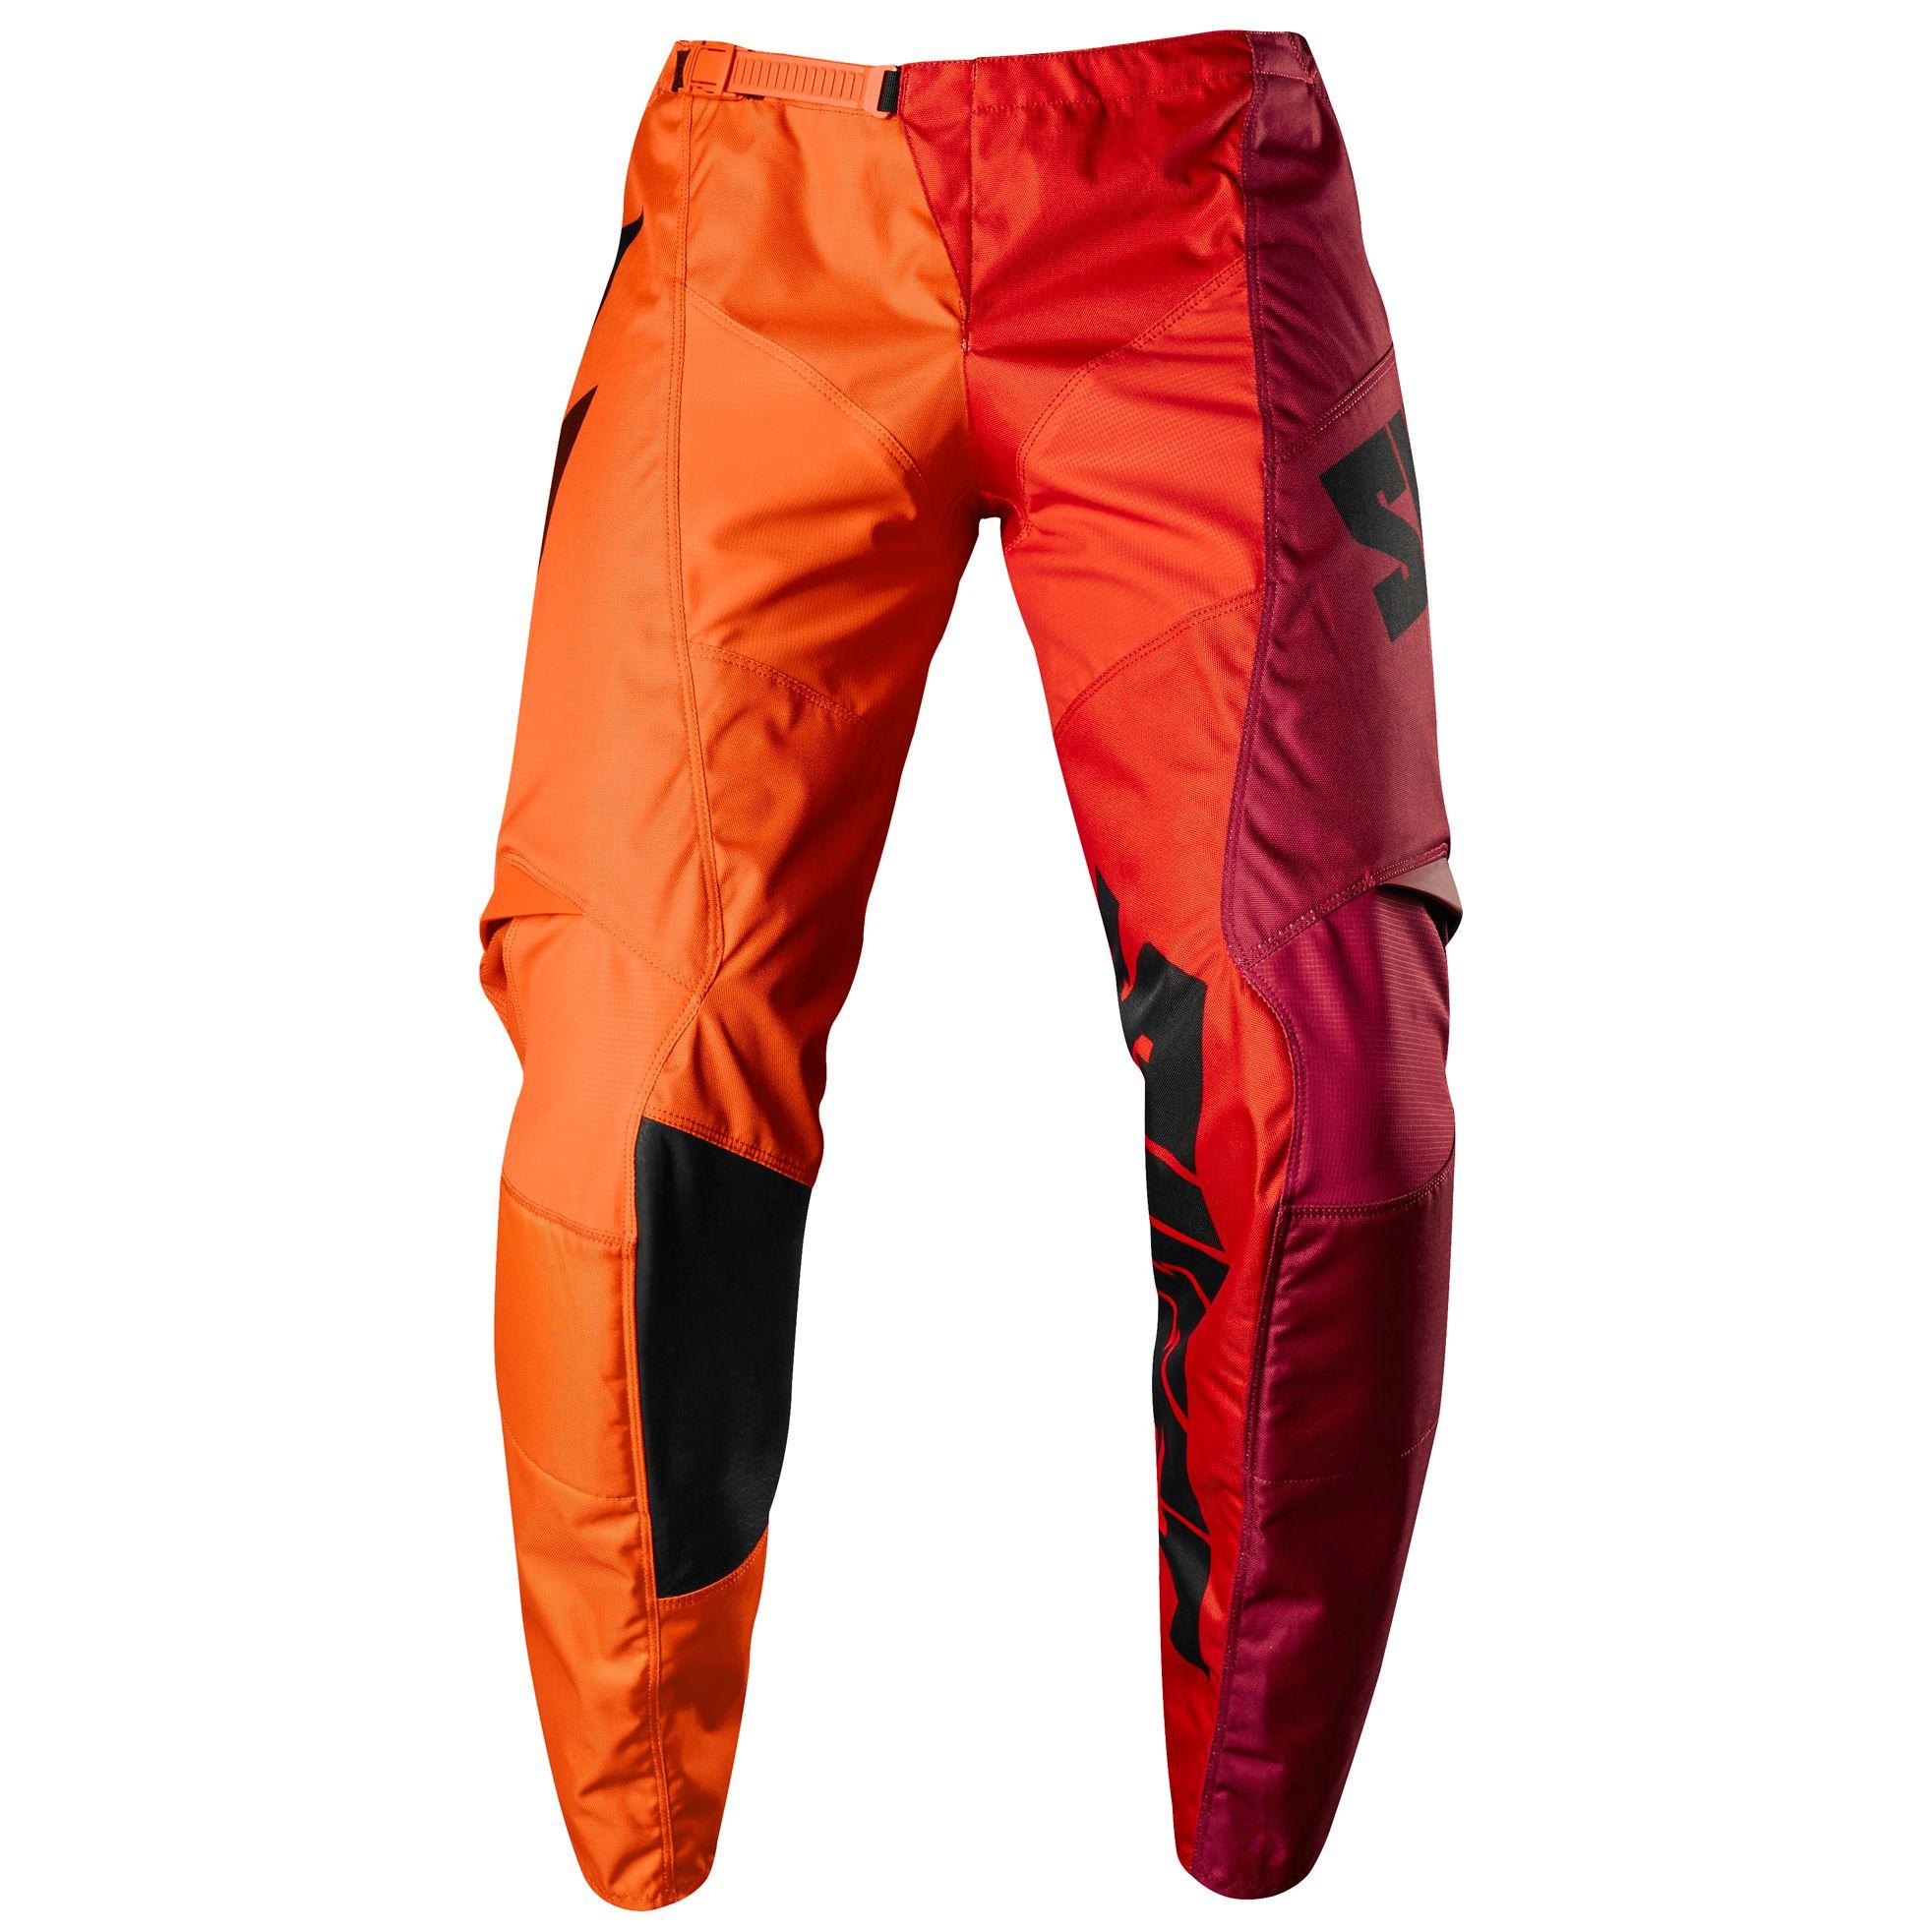 Pantalon cross Shift WHIT3 LABEL TARMAC Orange  2018